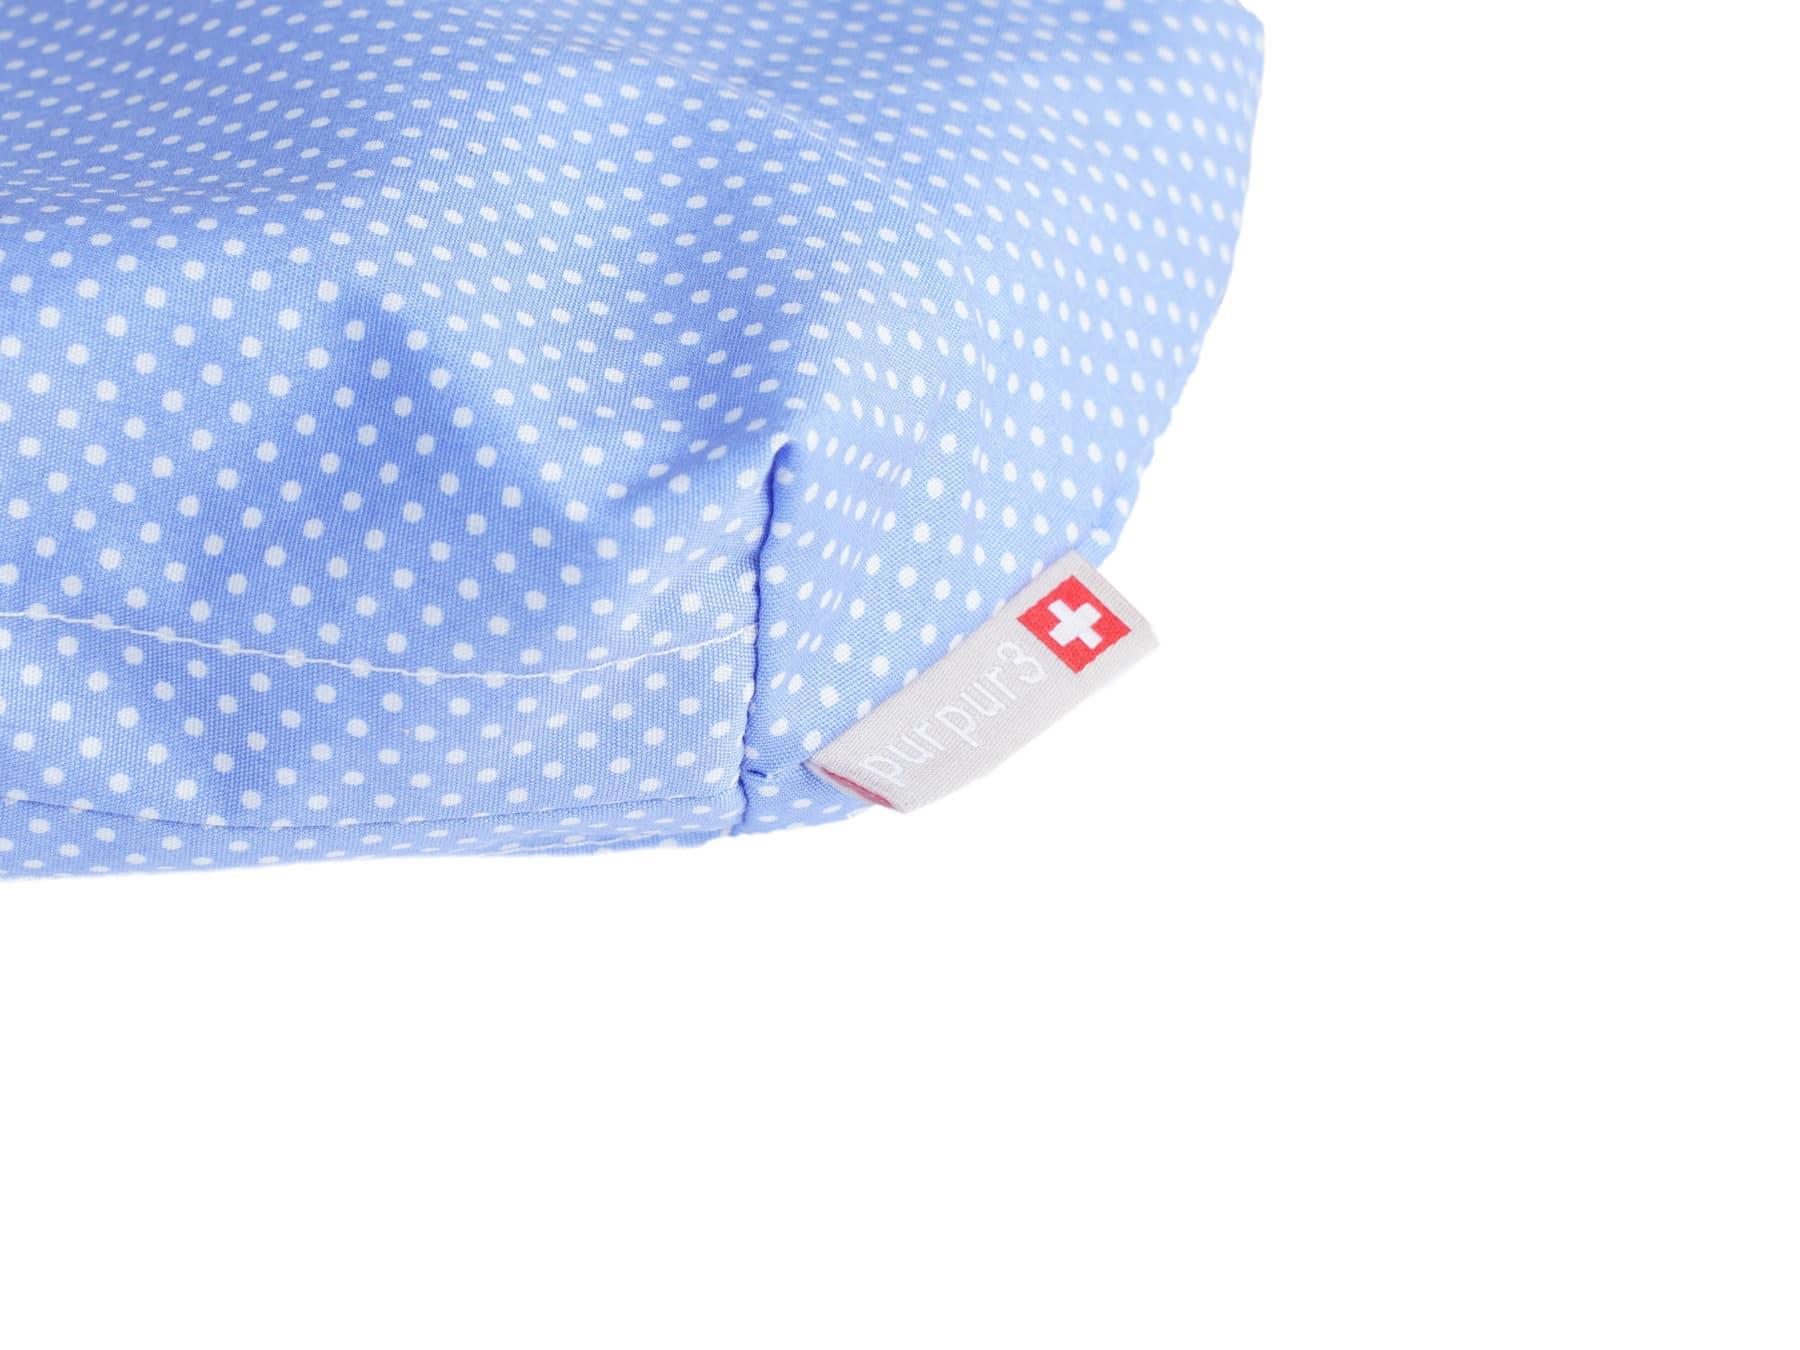 Necessaire Schweiz swissmade blau weiss getupft KURTS.ch